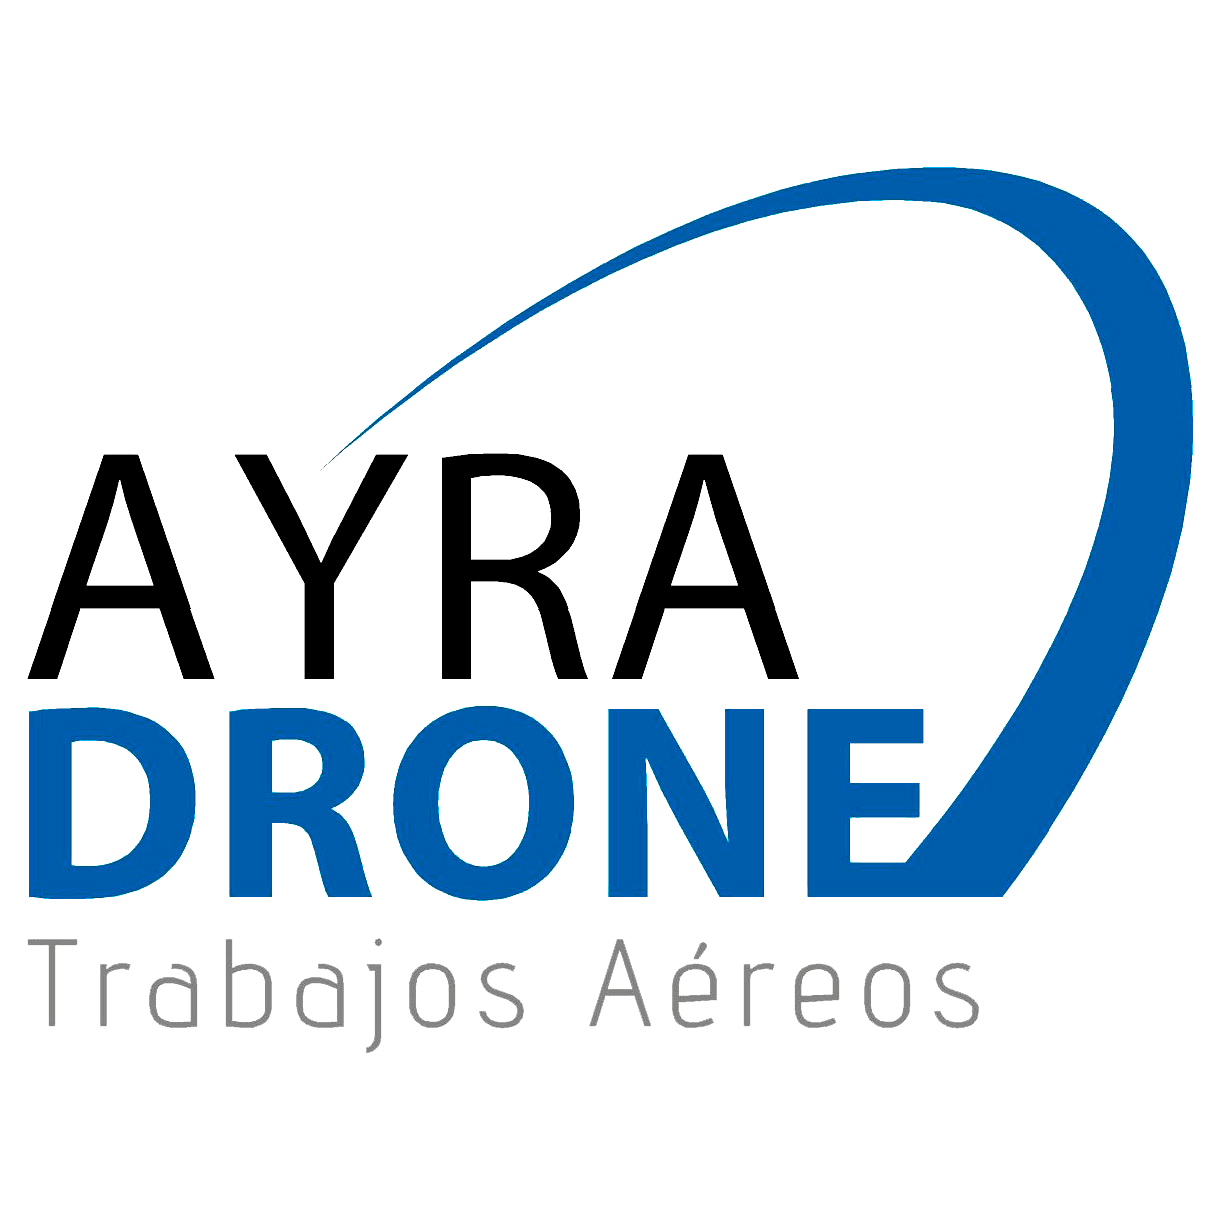 Ayradrone